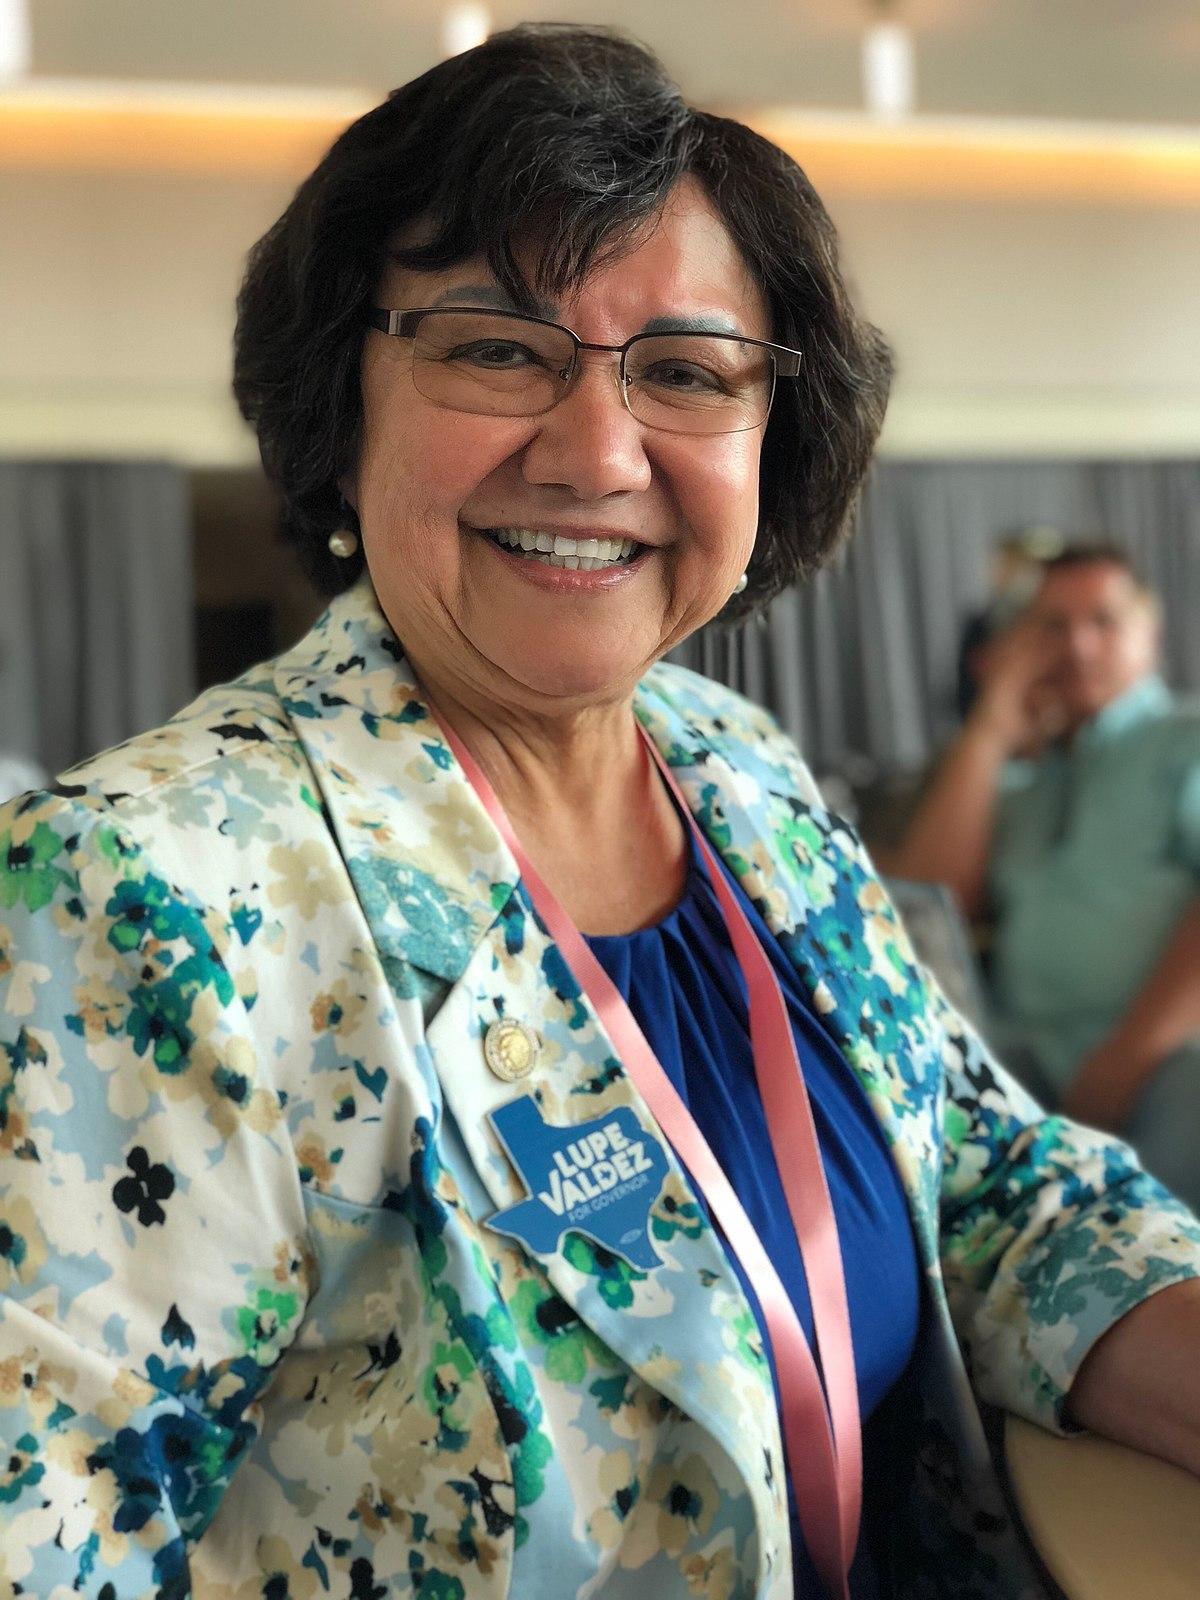 Lupe Valdez - Wikipedia